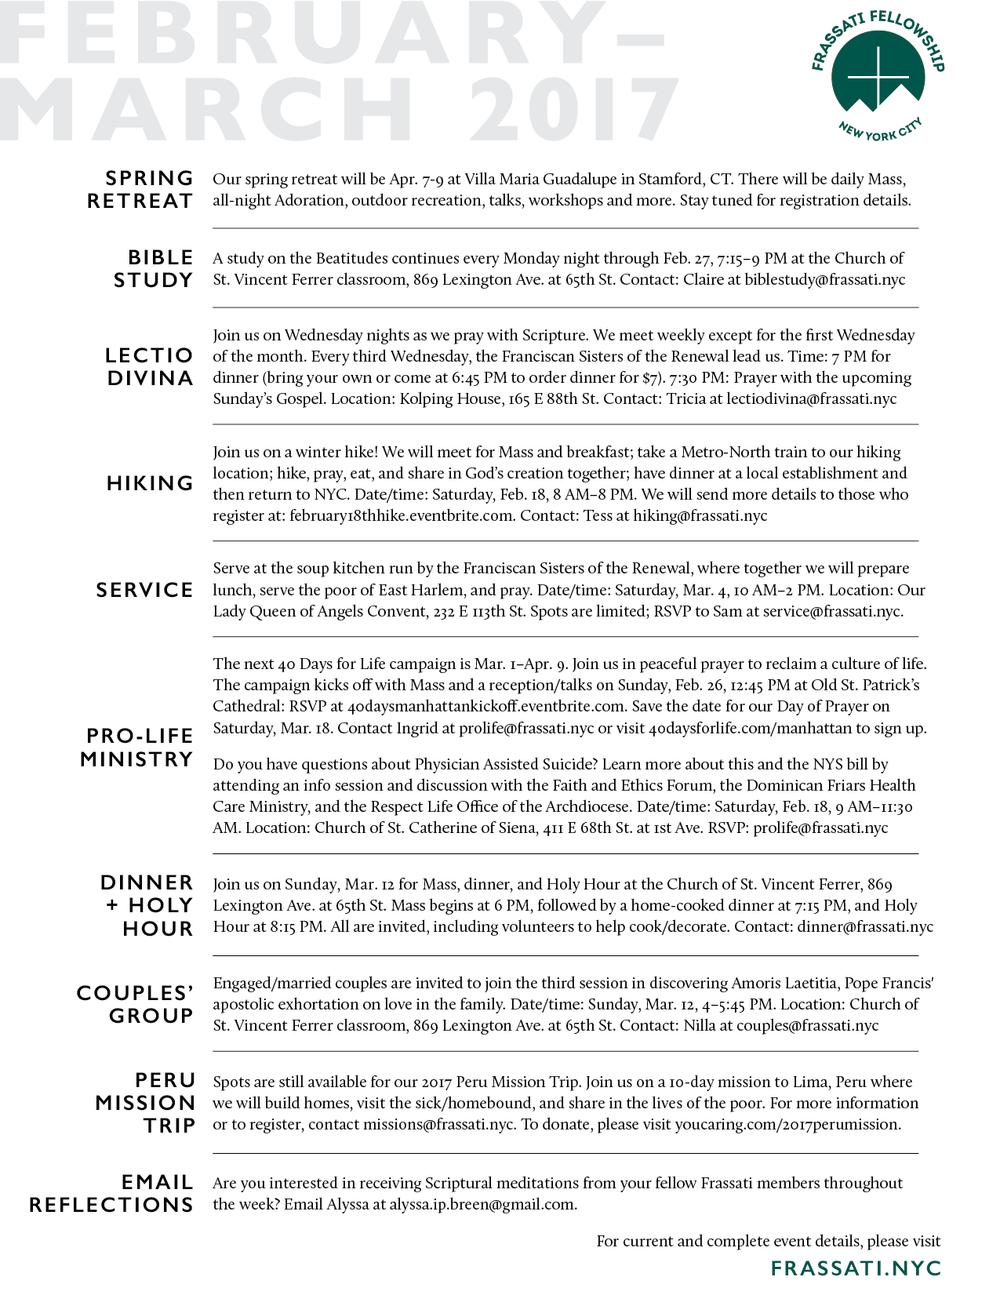 Frassati Fellowship of NYC · Identity — Nika DyBuncio